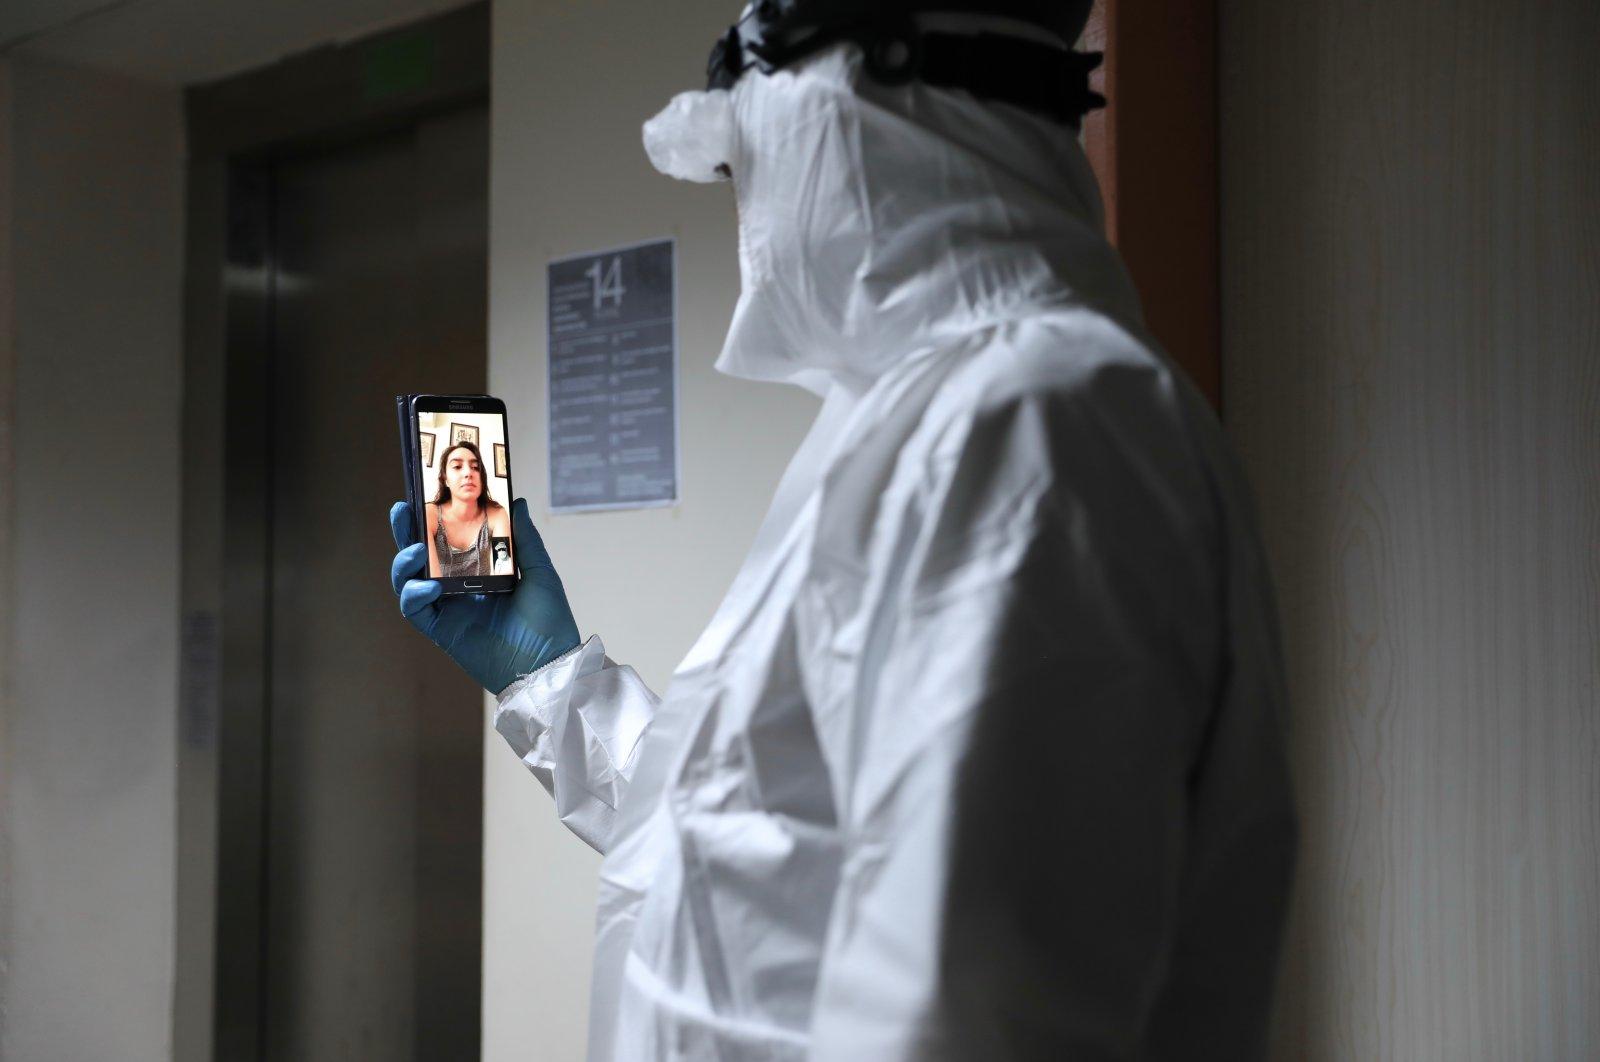 Doctor Mert Aydın talks to his daughter via videocall, in Izmir, Turkey, June 21, 2020. (AA Photo)